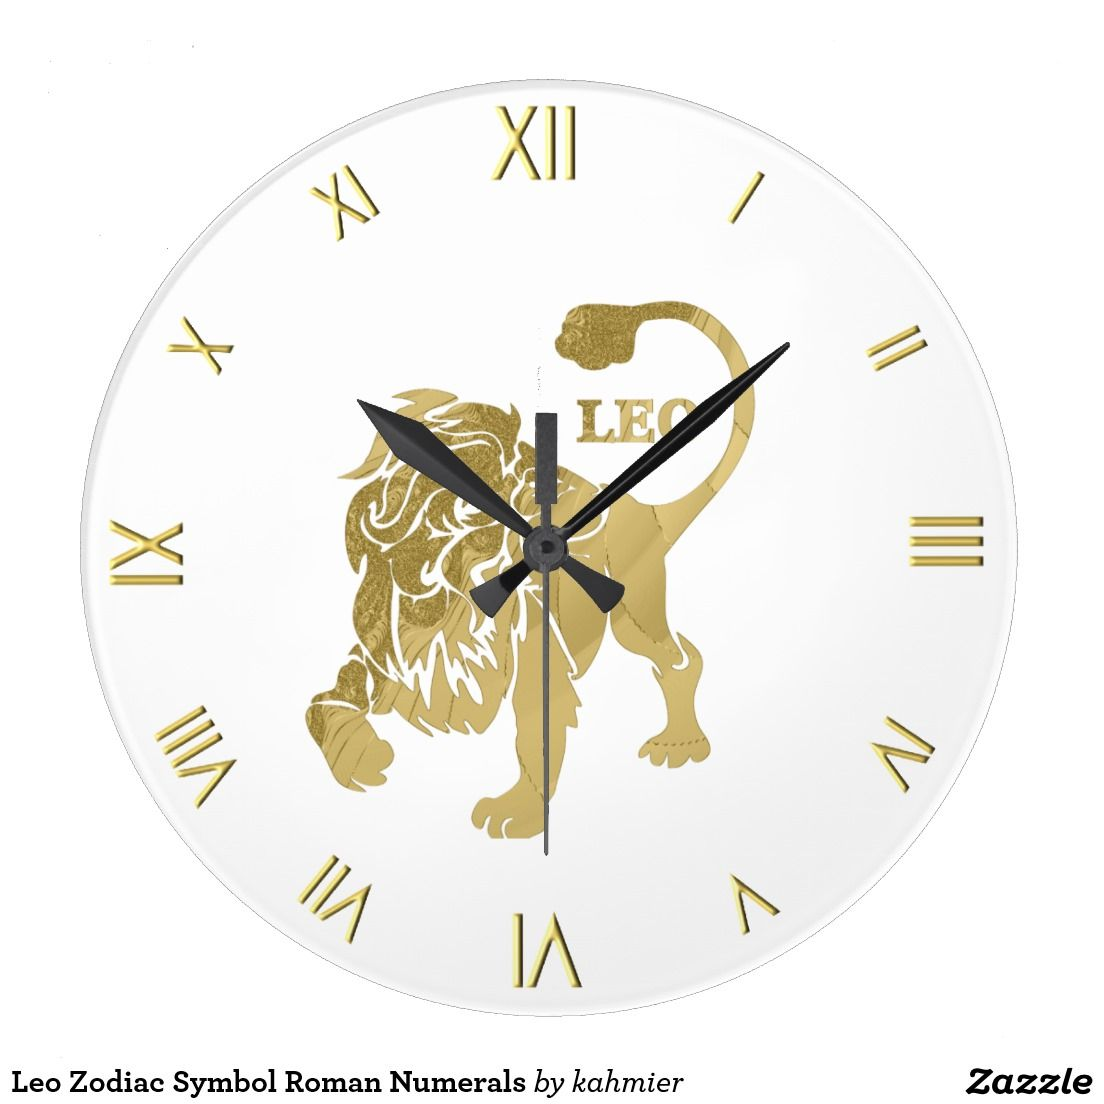 Leo zodiac symbol roman numerals large clock zodiac symbols leo leo zodiac symbol roman numerals large clock biocorpaavc